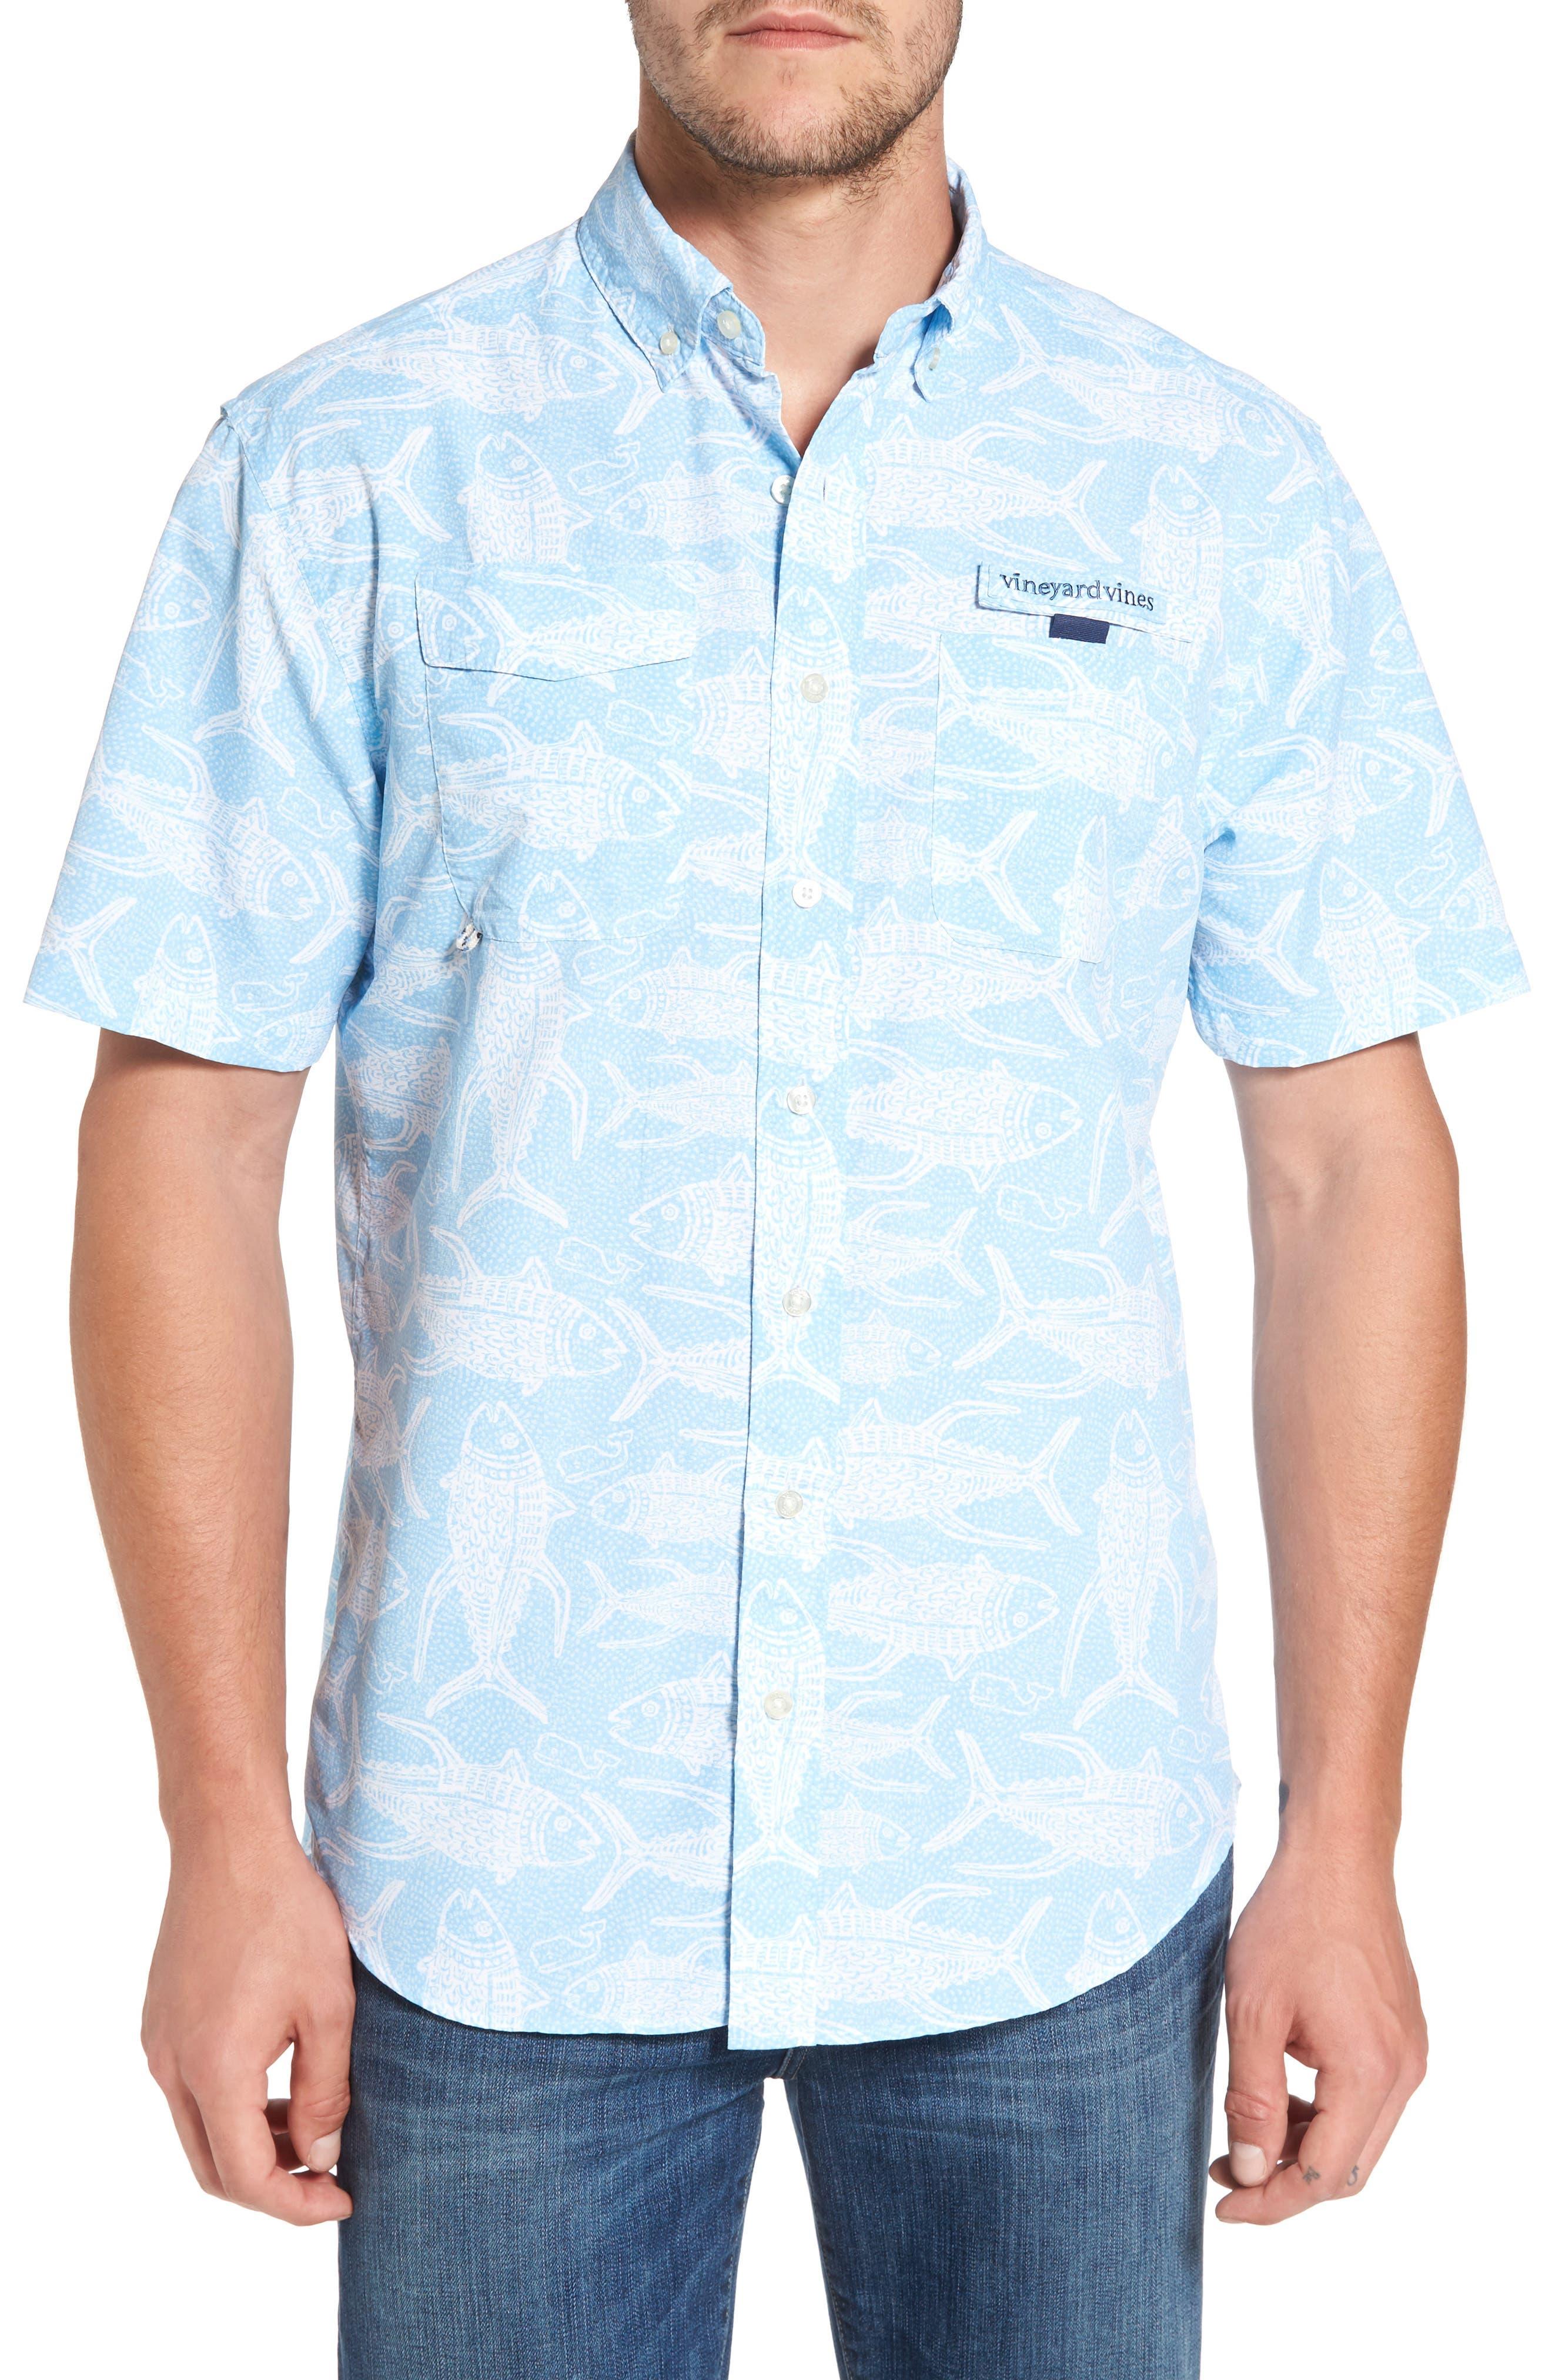 Main Image - Vineyard Vines Tuna Batic Harbor Short Sleeve Sport Shirt